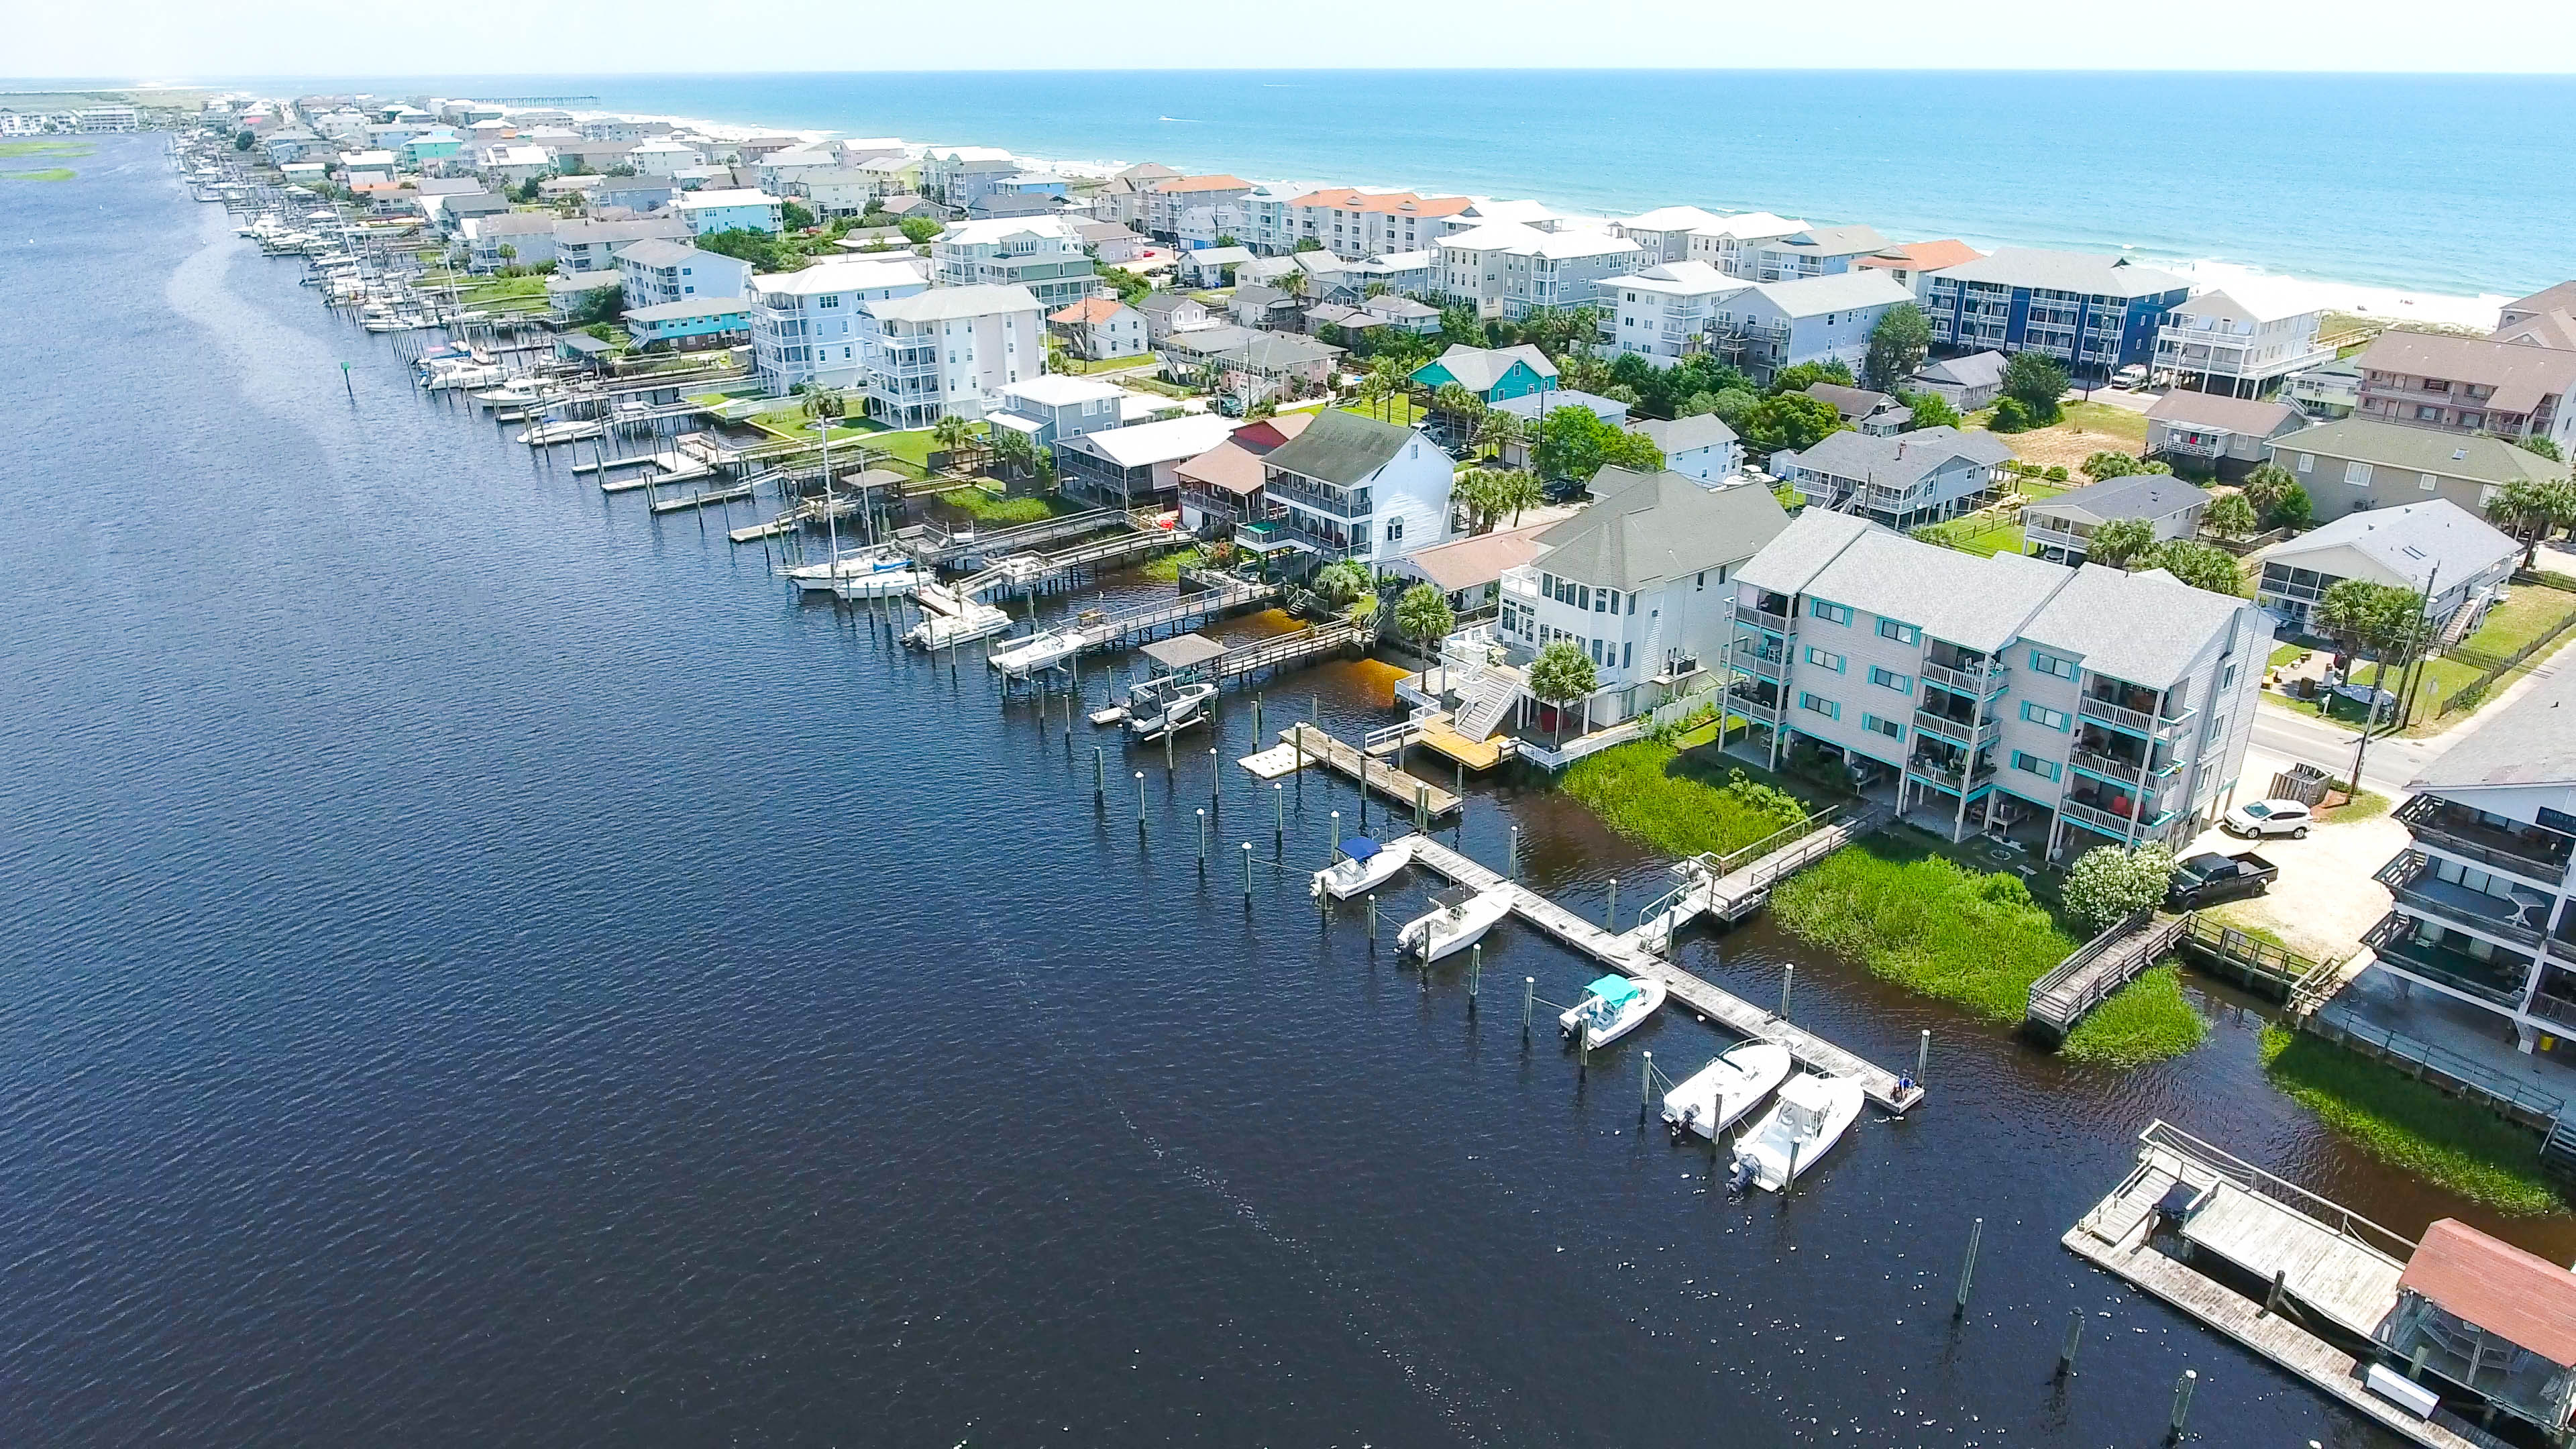 Awe Inspiring Carolina Beach Vacation Homes Beachfront Condo Rentals Download Free Architecture Designs Grimeyleaguecom